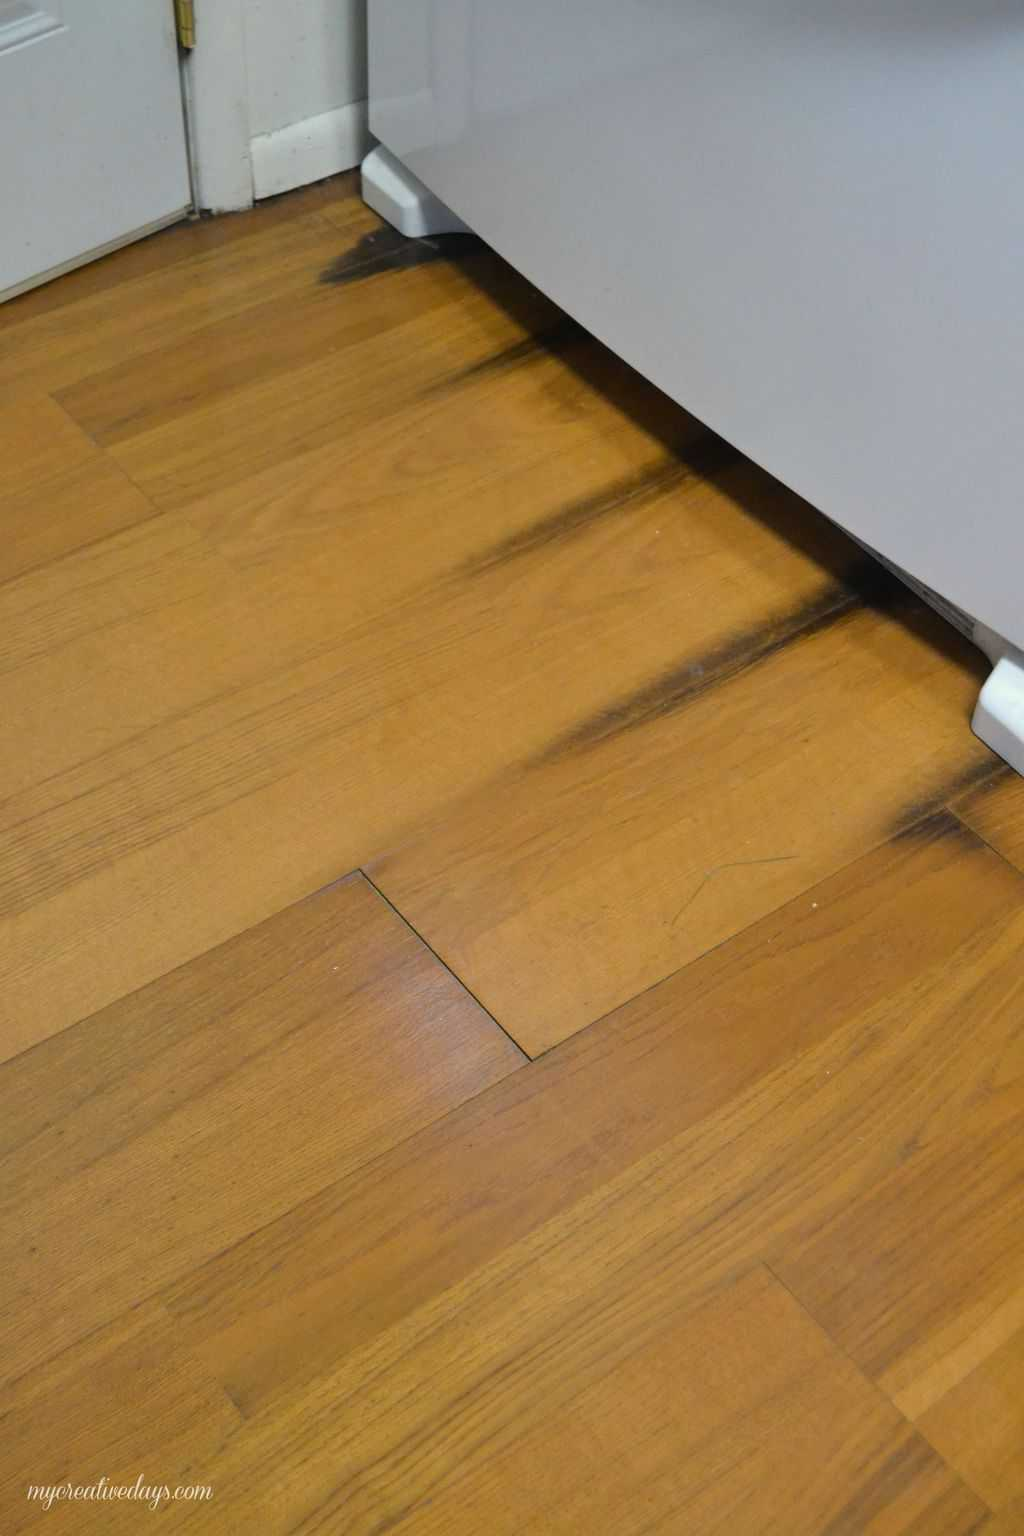 kitchen makeover laminate flooring flooring for kitchen Pin this Kitchen Makeover Laying Laminate Flooring mycreativedays com